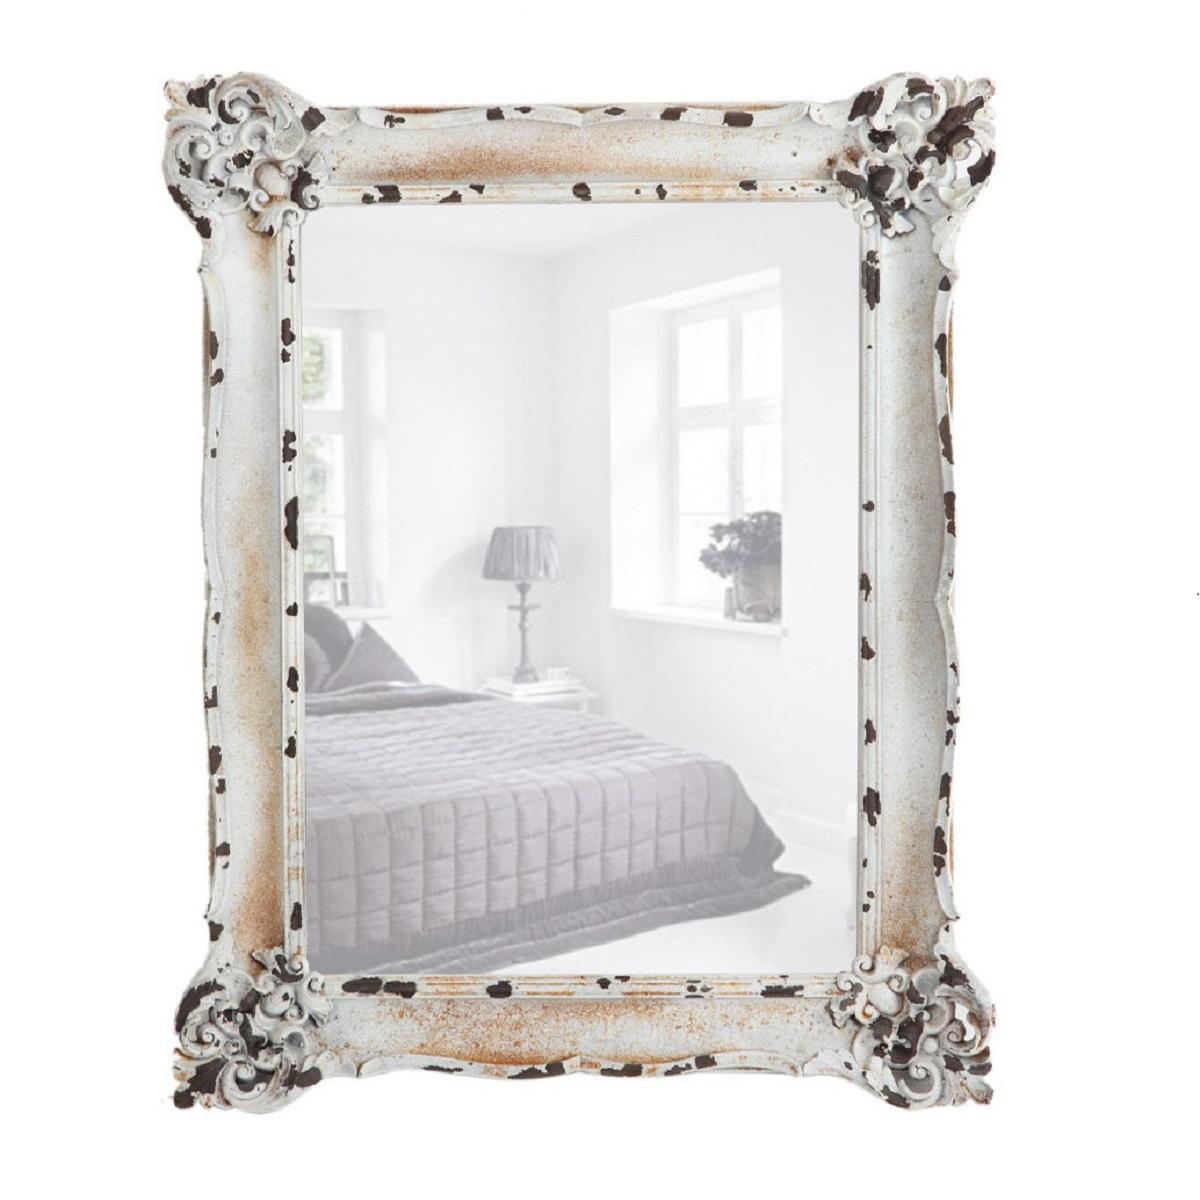 Зеркала Зеркало настенное Decor H13S0193 zerkalo-nastennoe-decor-h13s0193-kitay.JPG